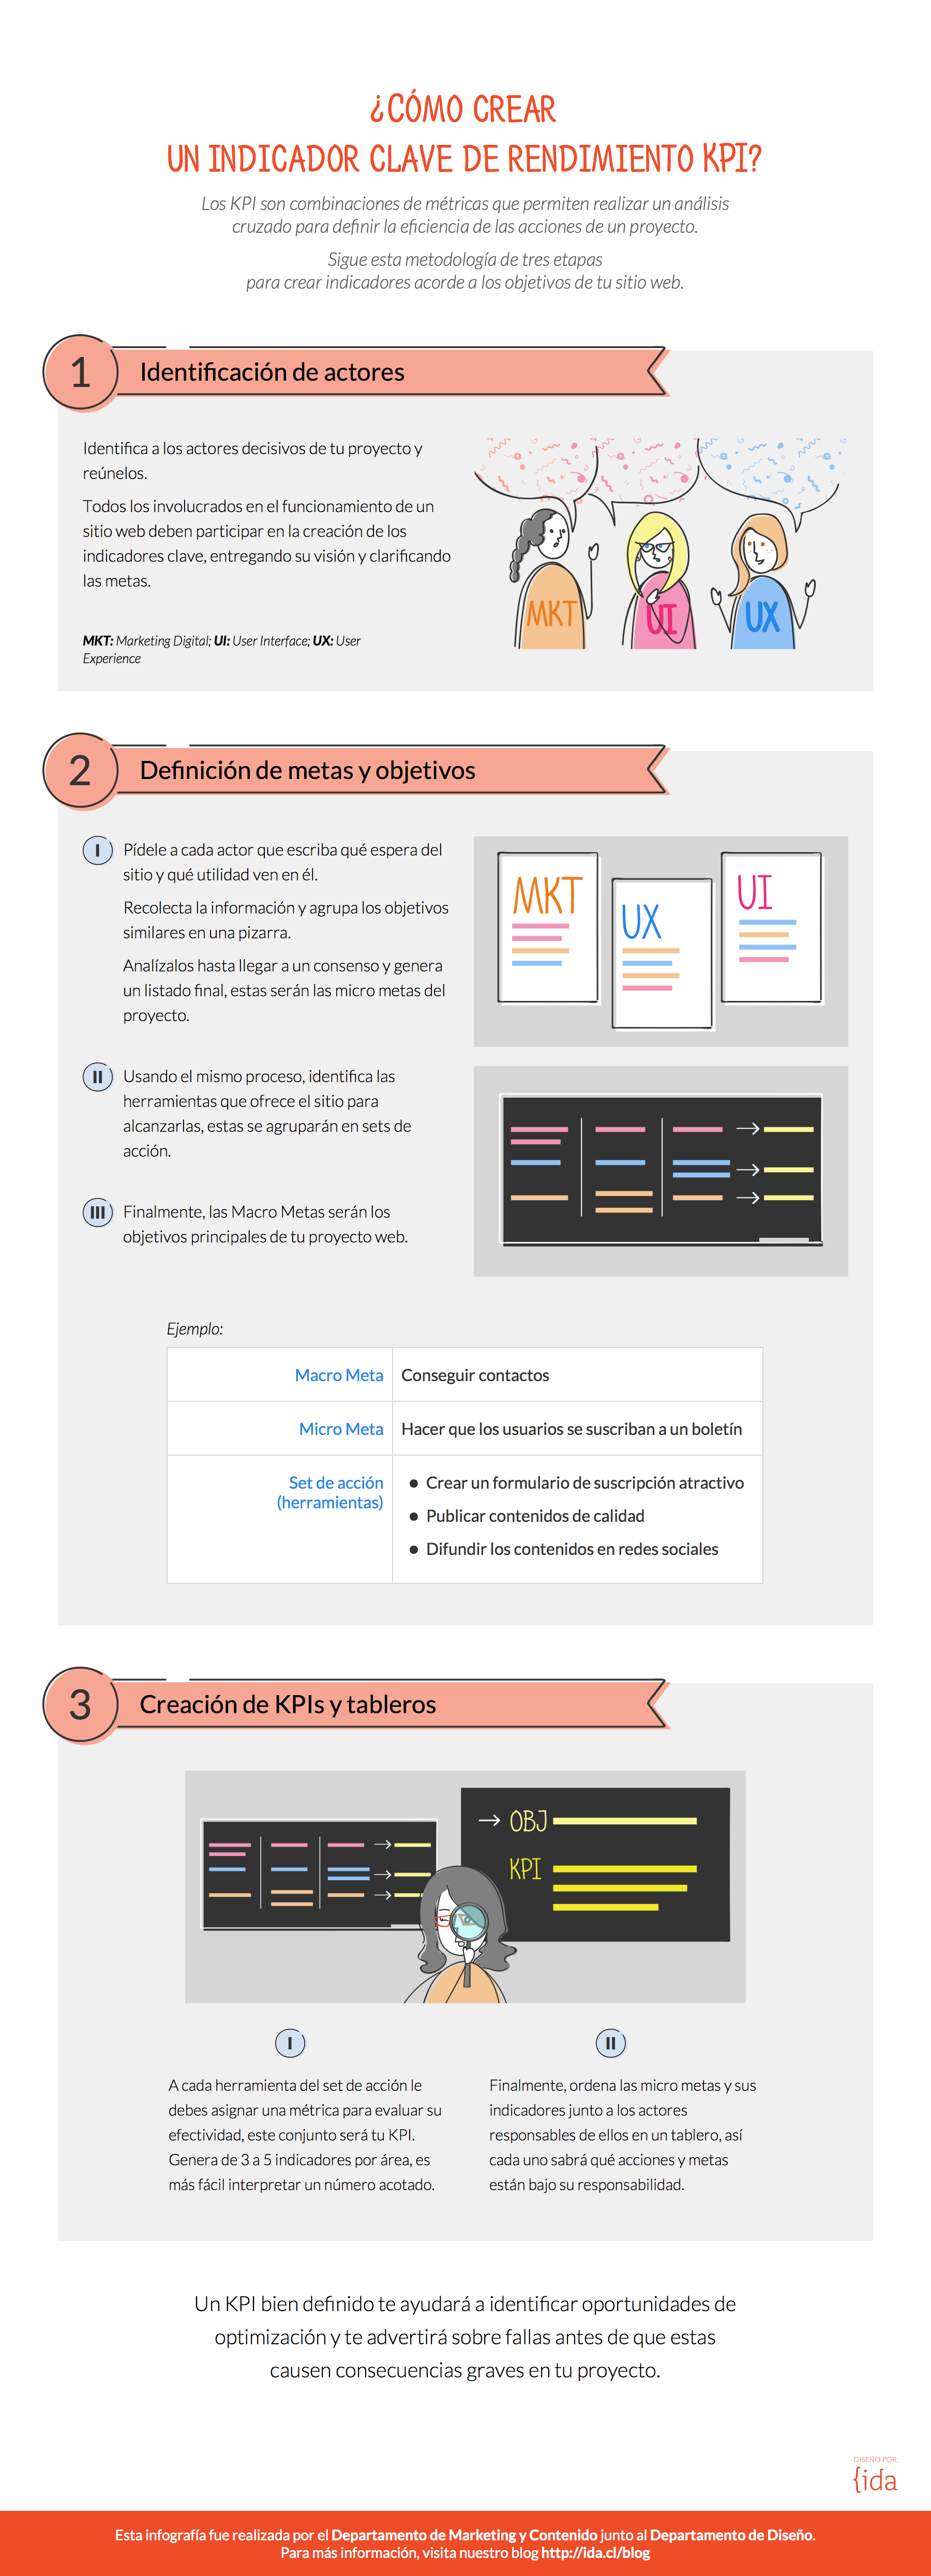 infografía sobre KPI